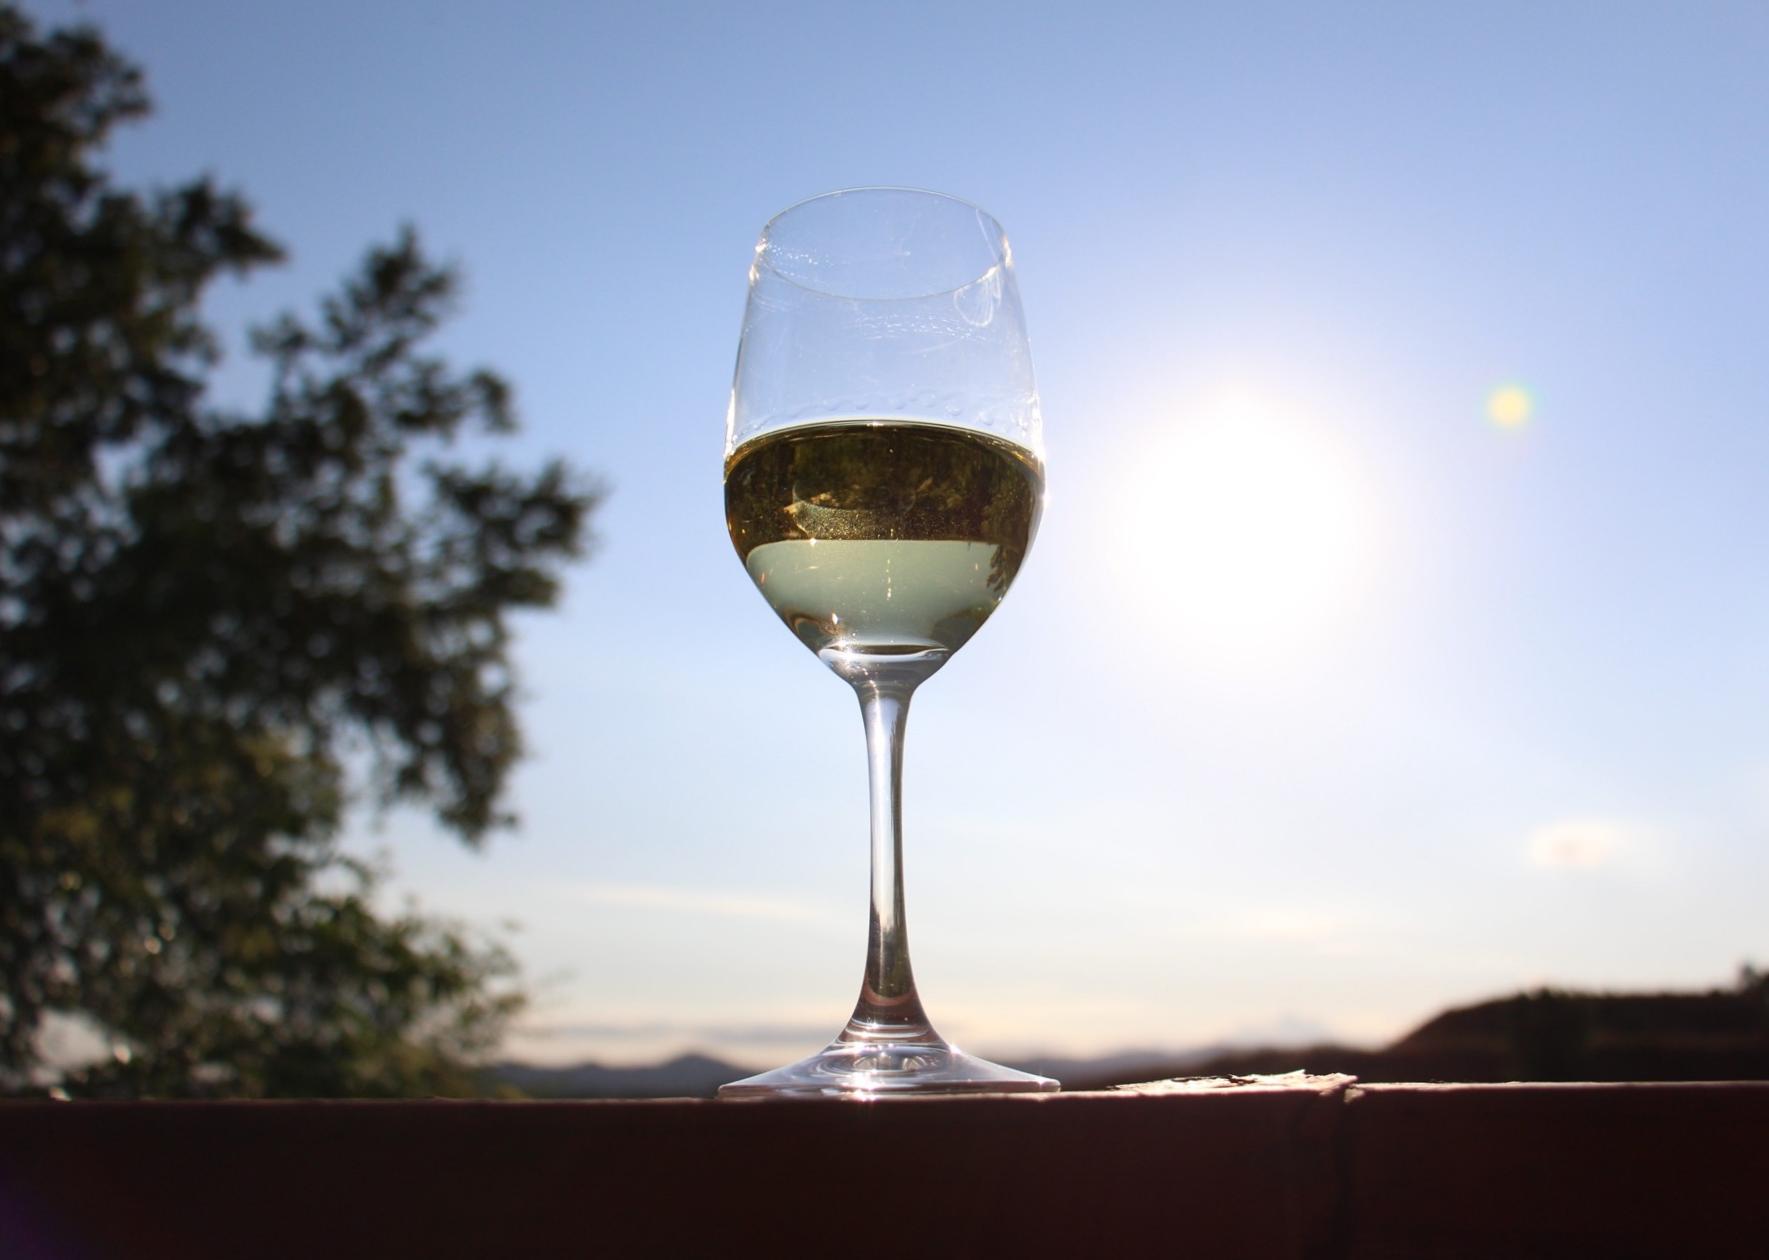 trader joe's wine reviews the wine idiot bargain wine la crema chardonnay 2013 sonoma coast review